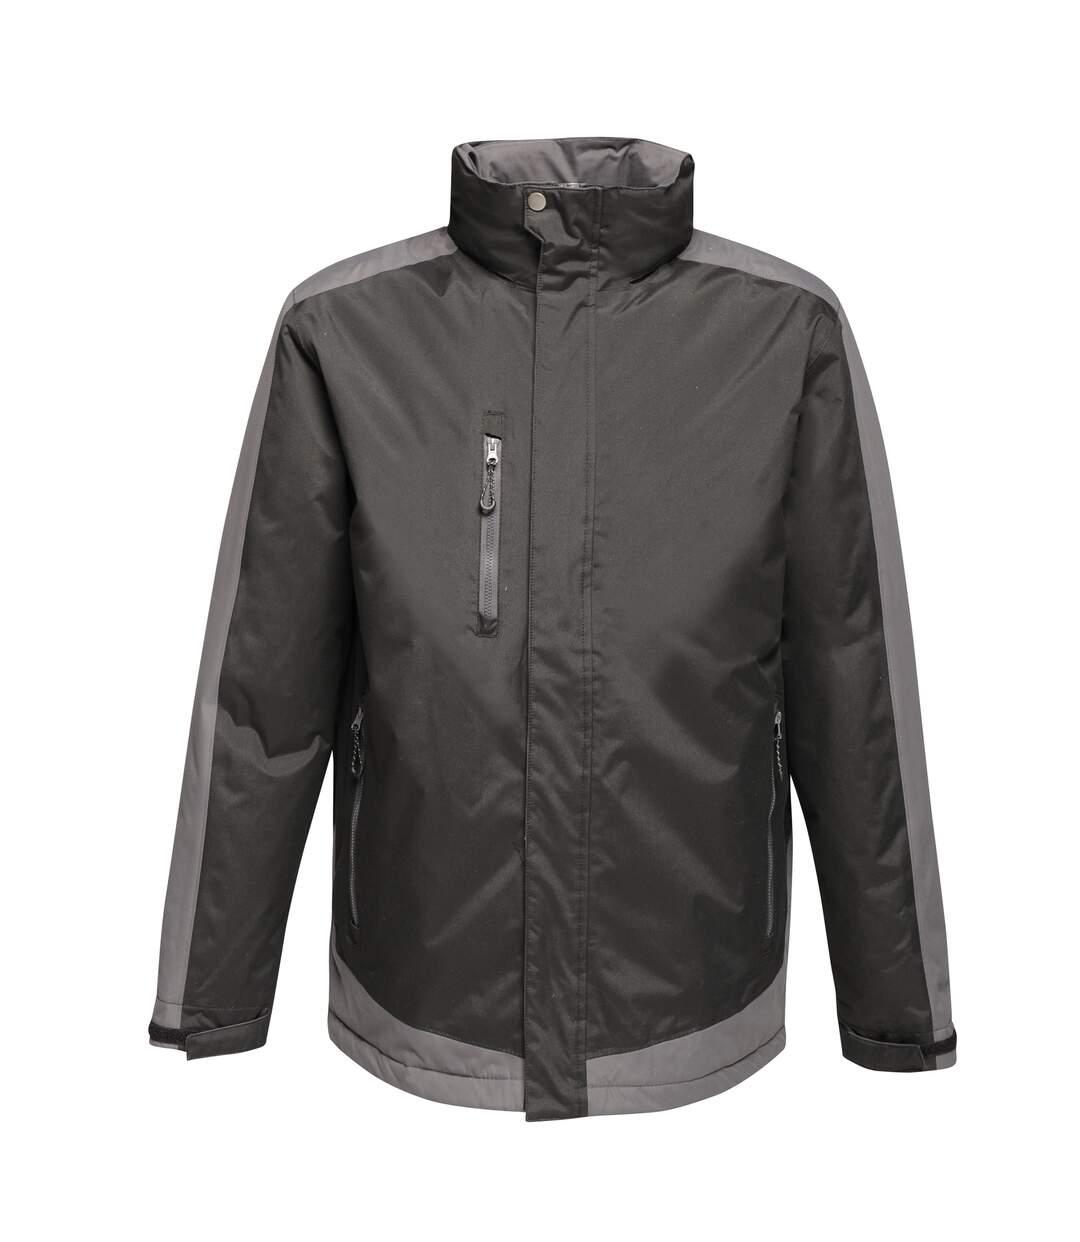 Regatta Contrast Mens Insulated jacket (Black/Seal) - UTRW6354